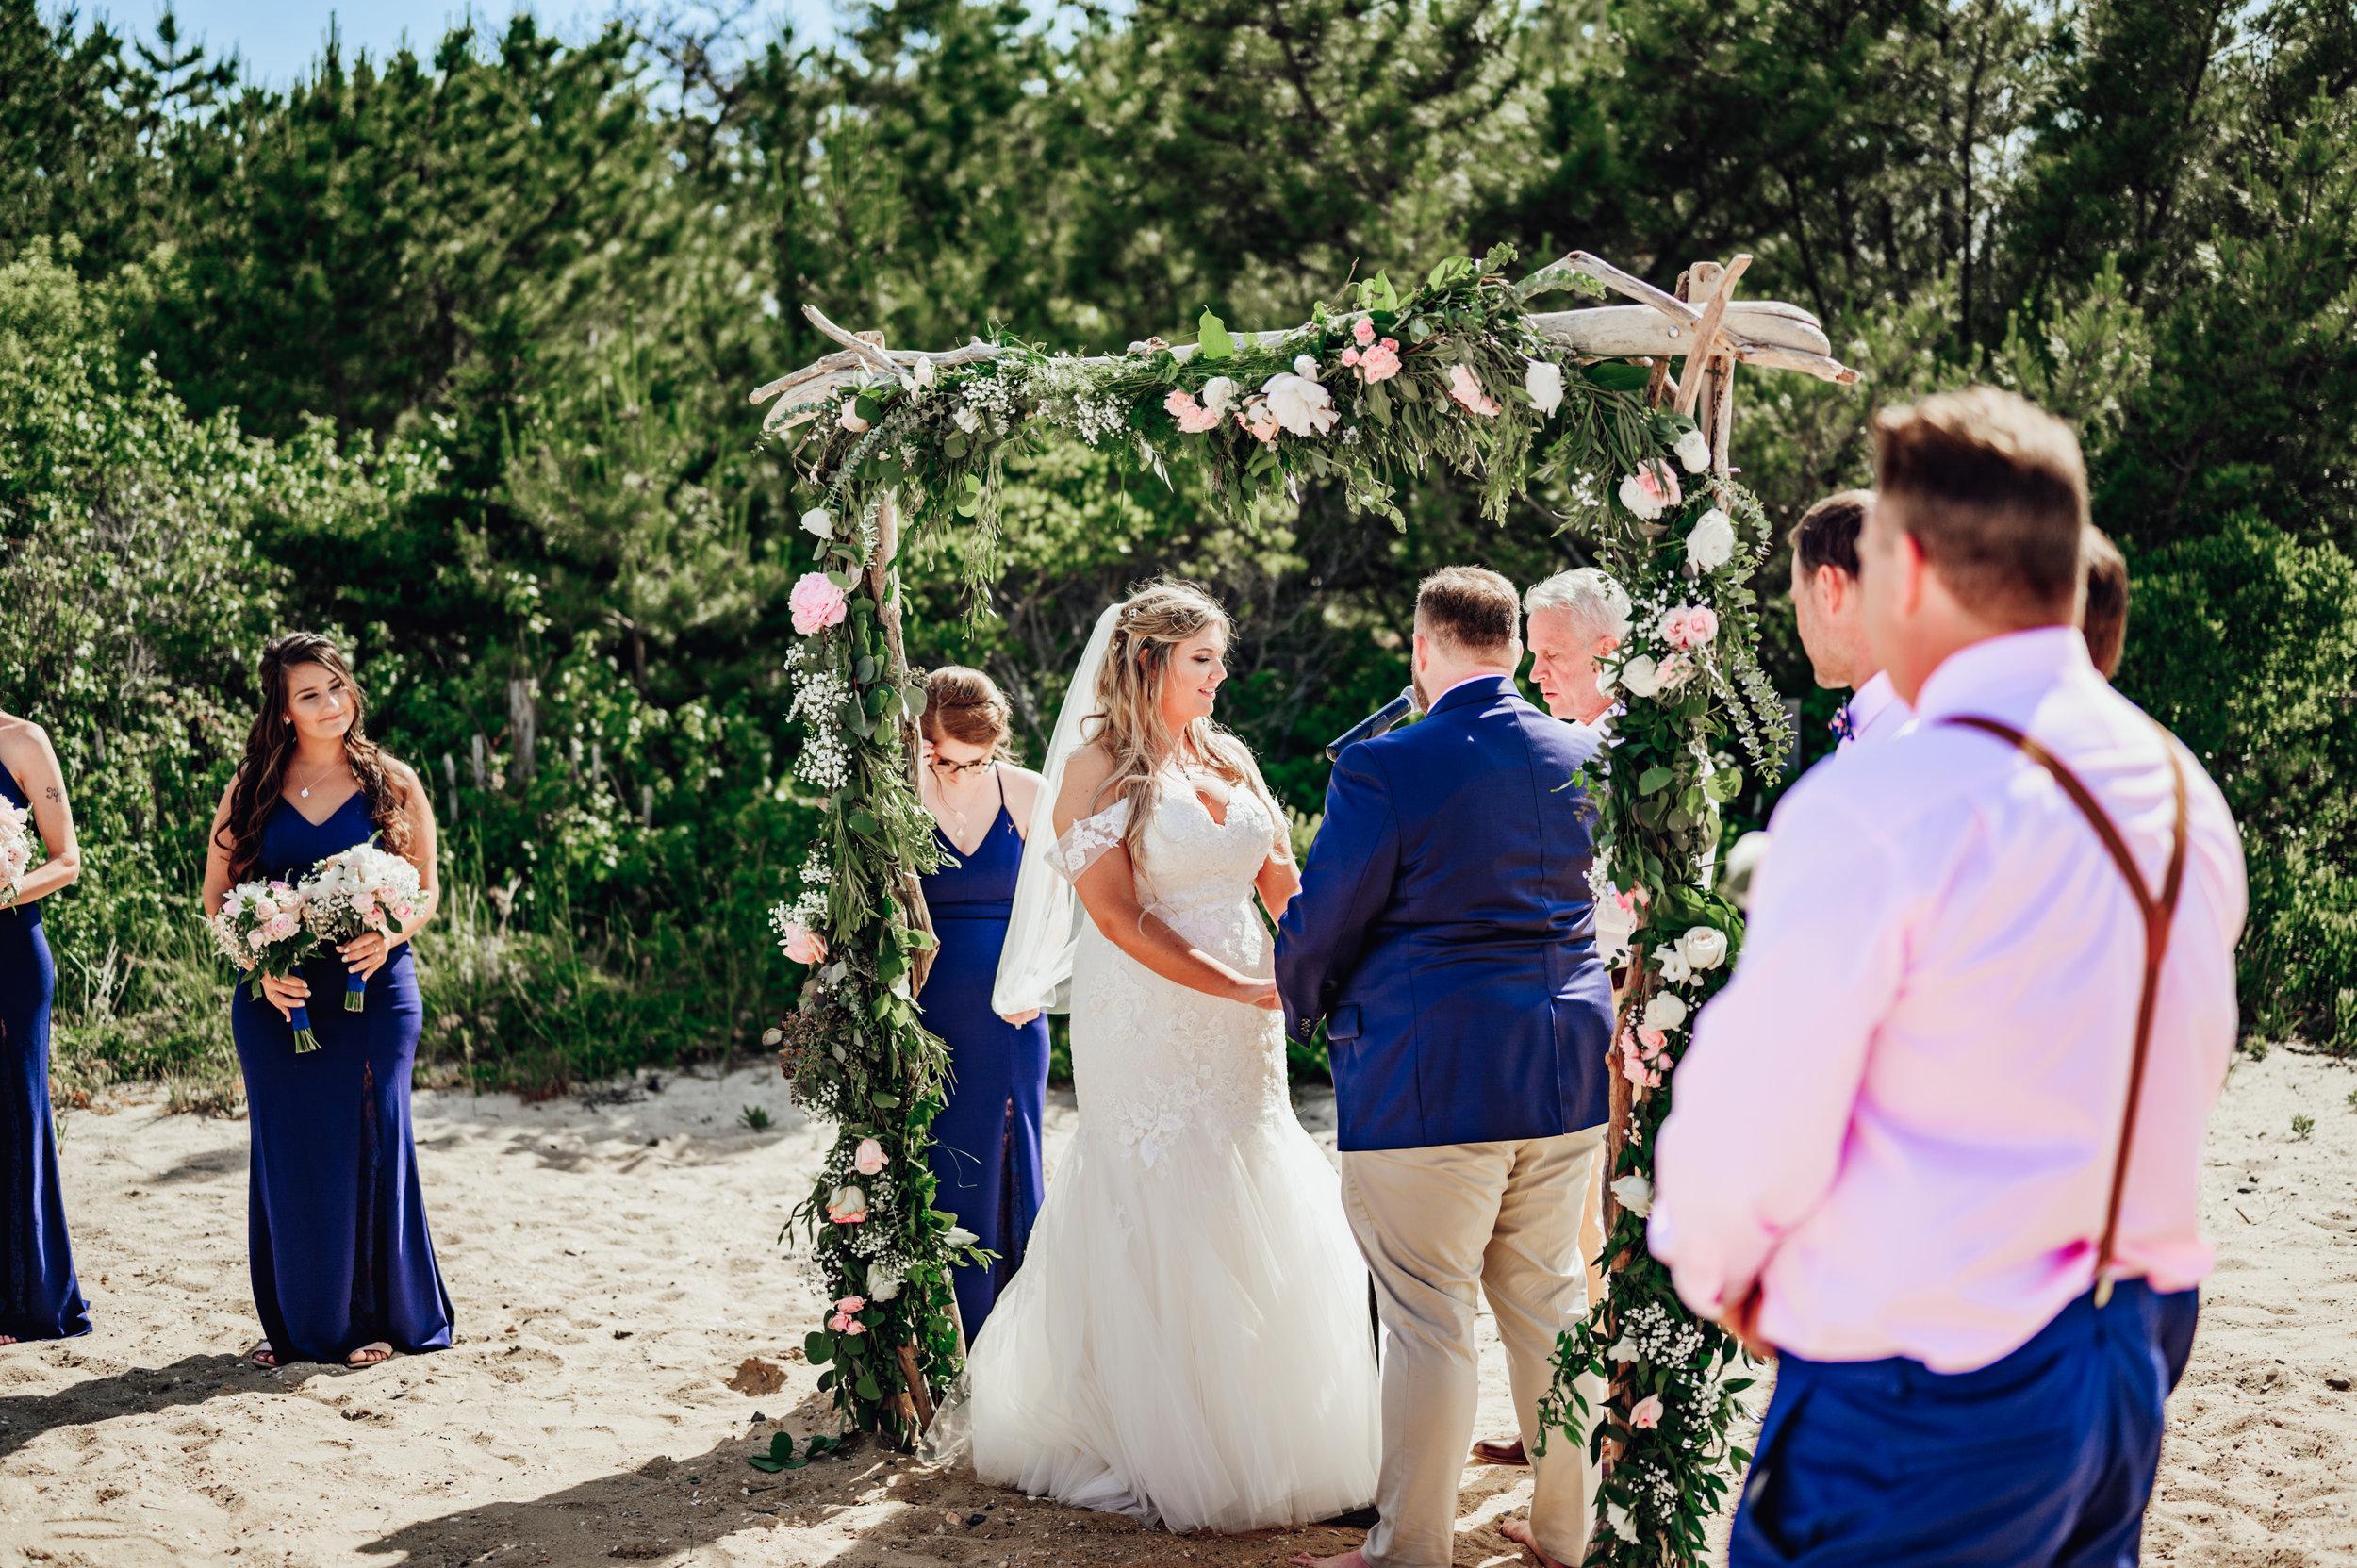 New Jersey Wedding Photographer, Felsberg Photography LBI wedding photography 72.jpg